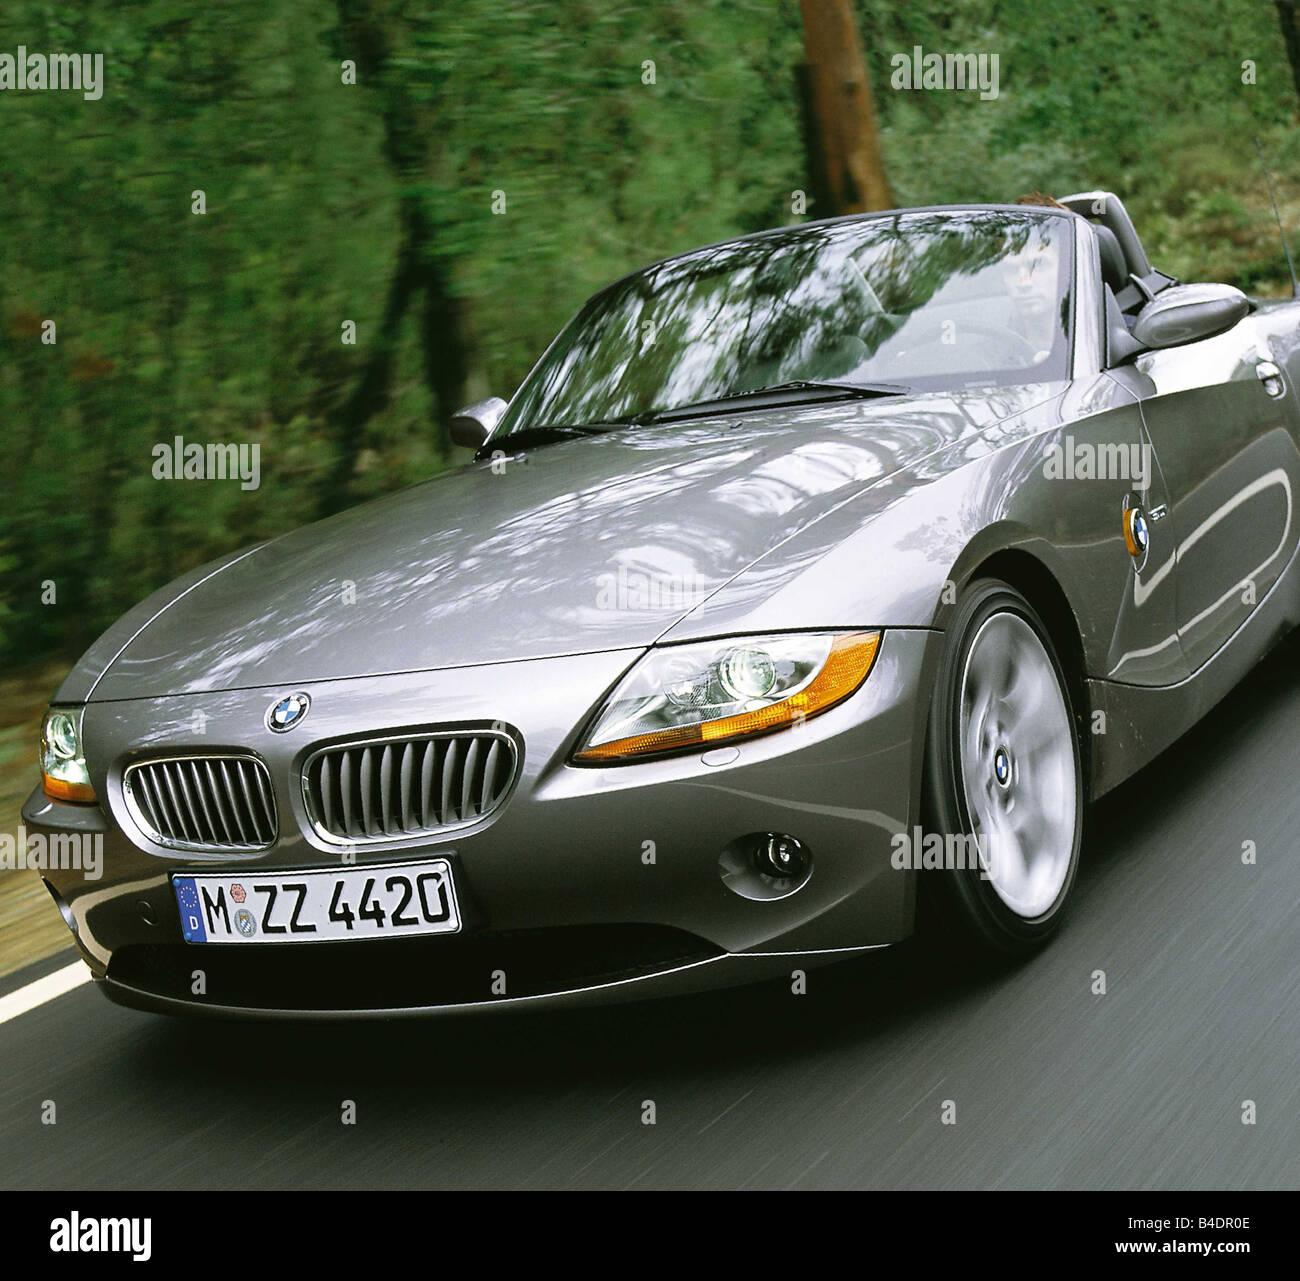 Bmw Year Models: Car Bmw Z4 Convertible Model Stock Photos & Car Bmw Z4